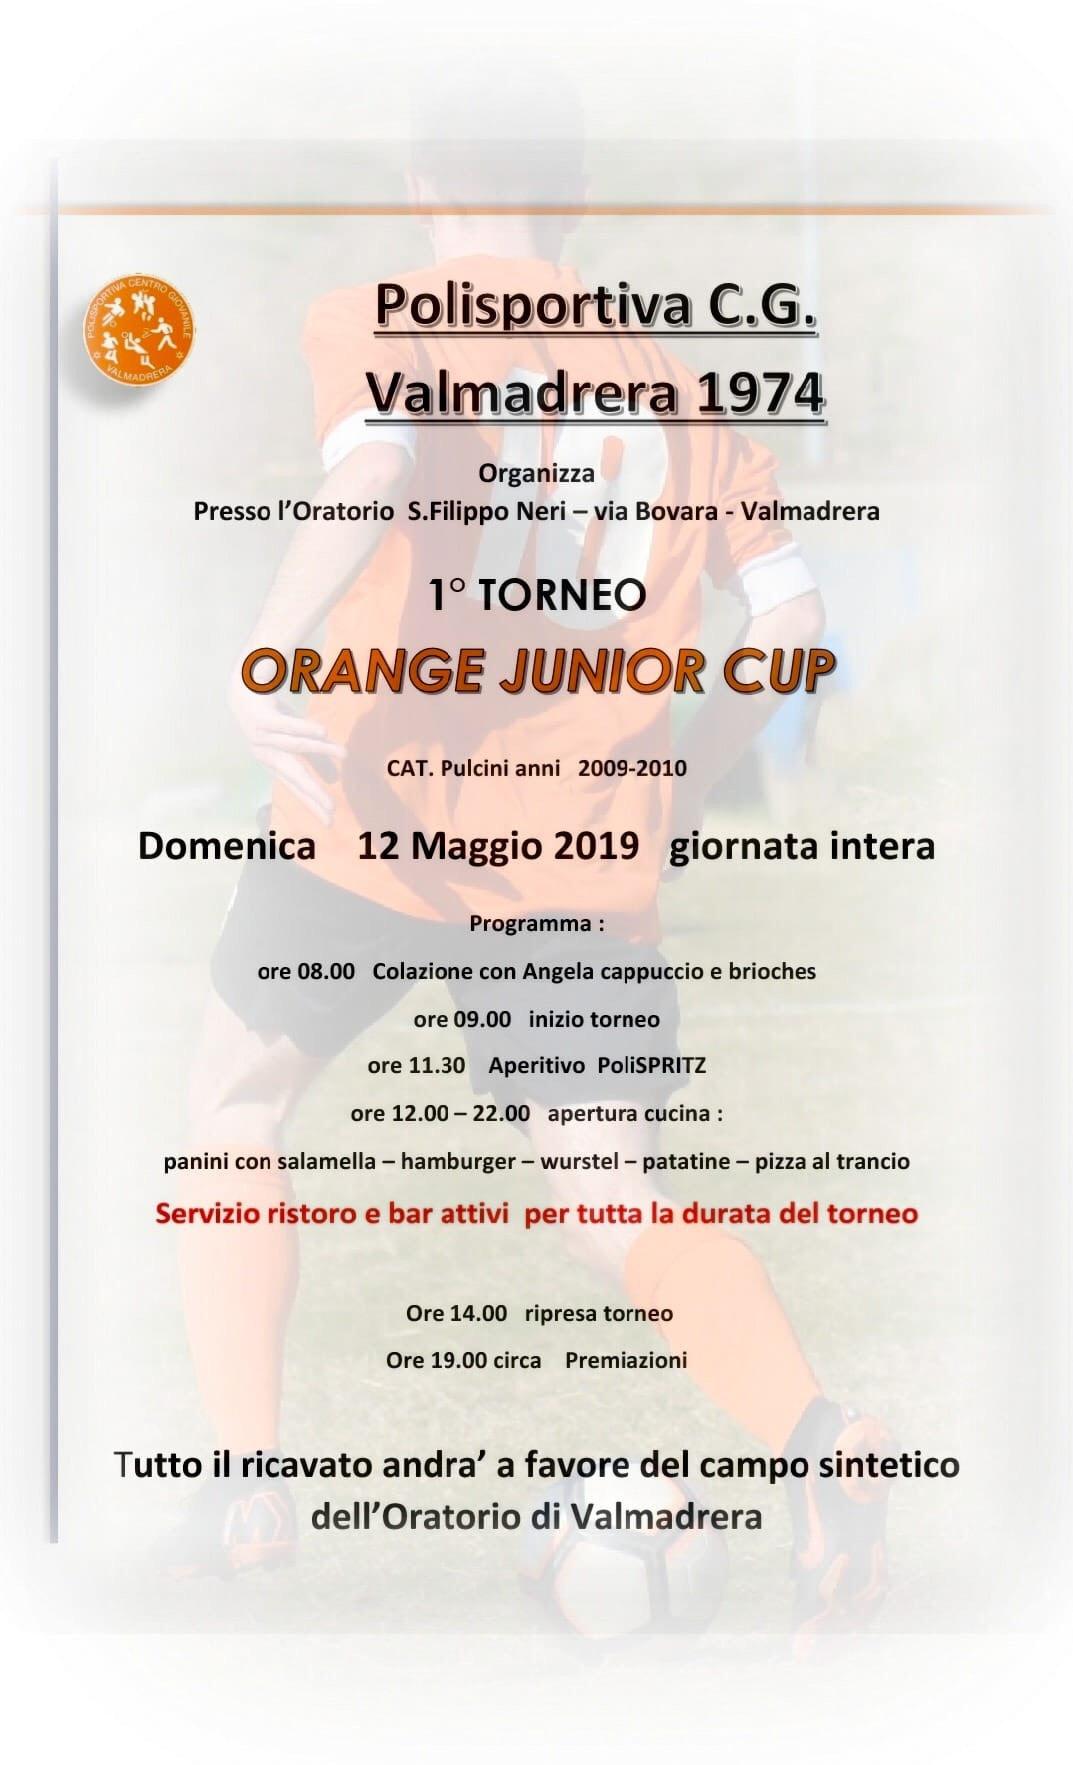 locandina orange cup 2019 polisportiva valmadrera-2